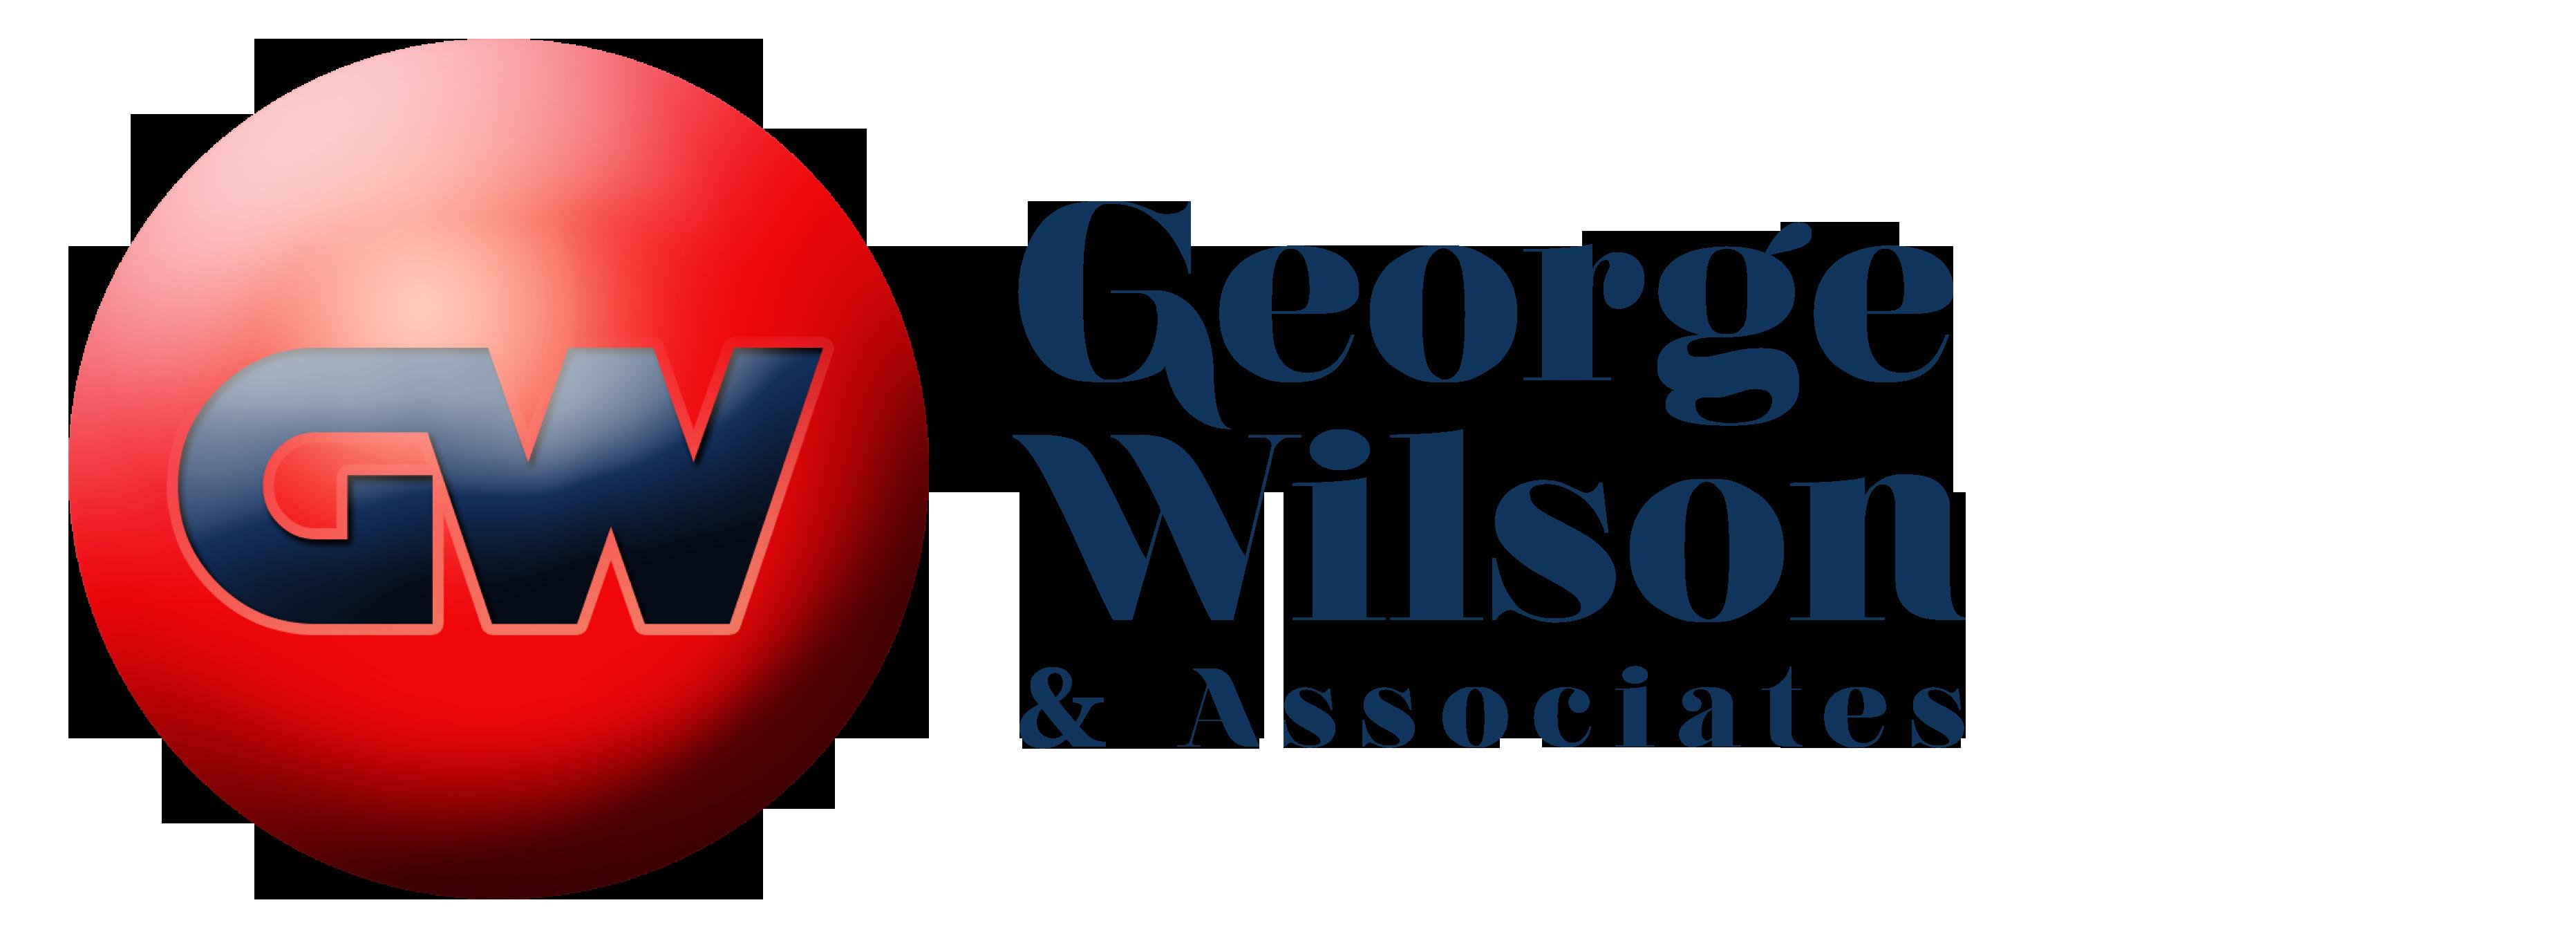 George Wilson & Associates Logo